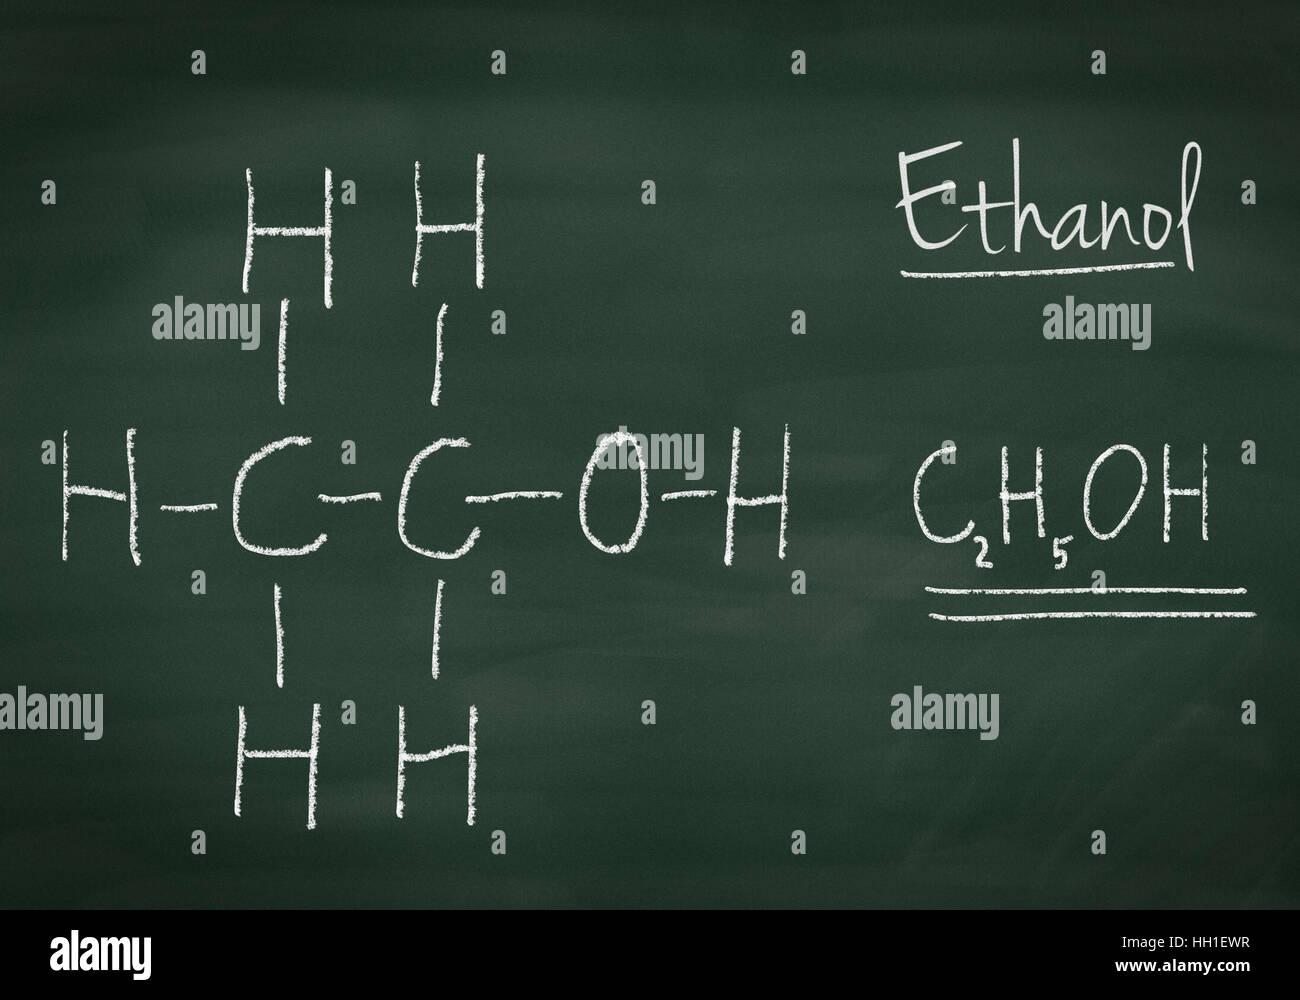 Chemical formula of ethanol on a chalkboard - Stock Image